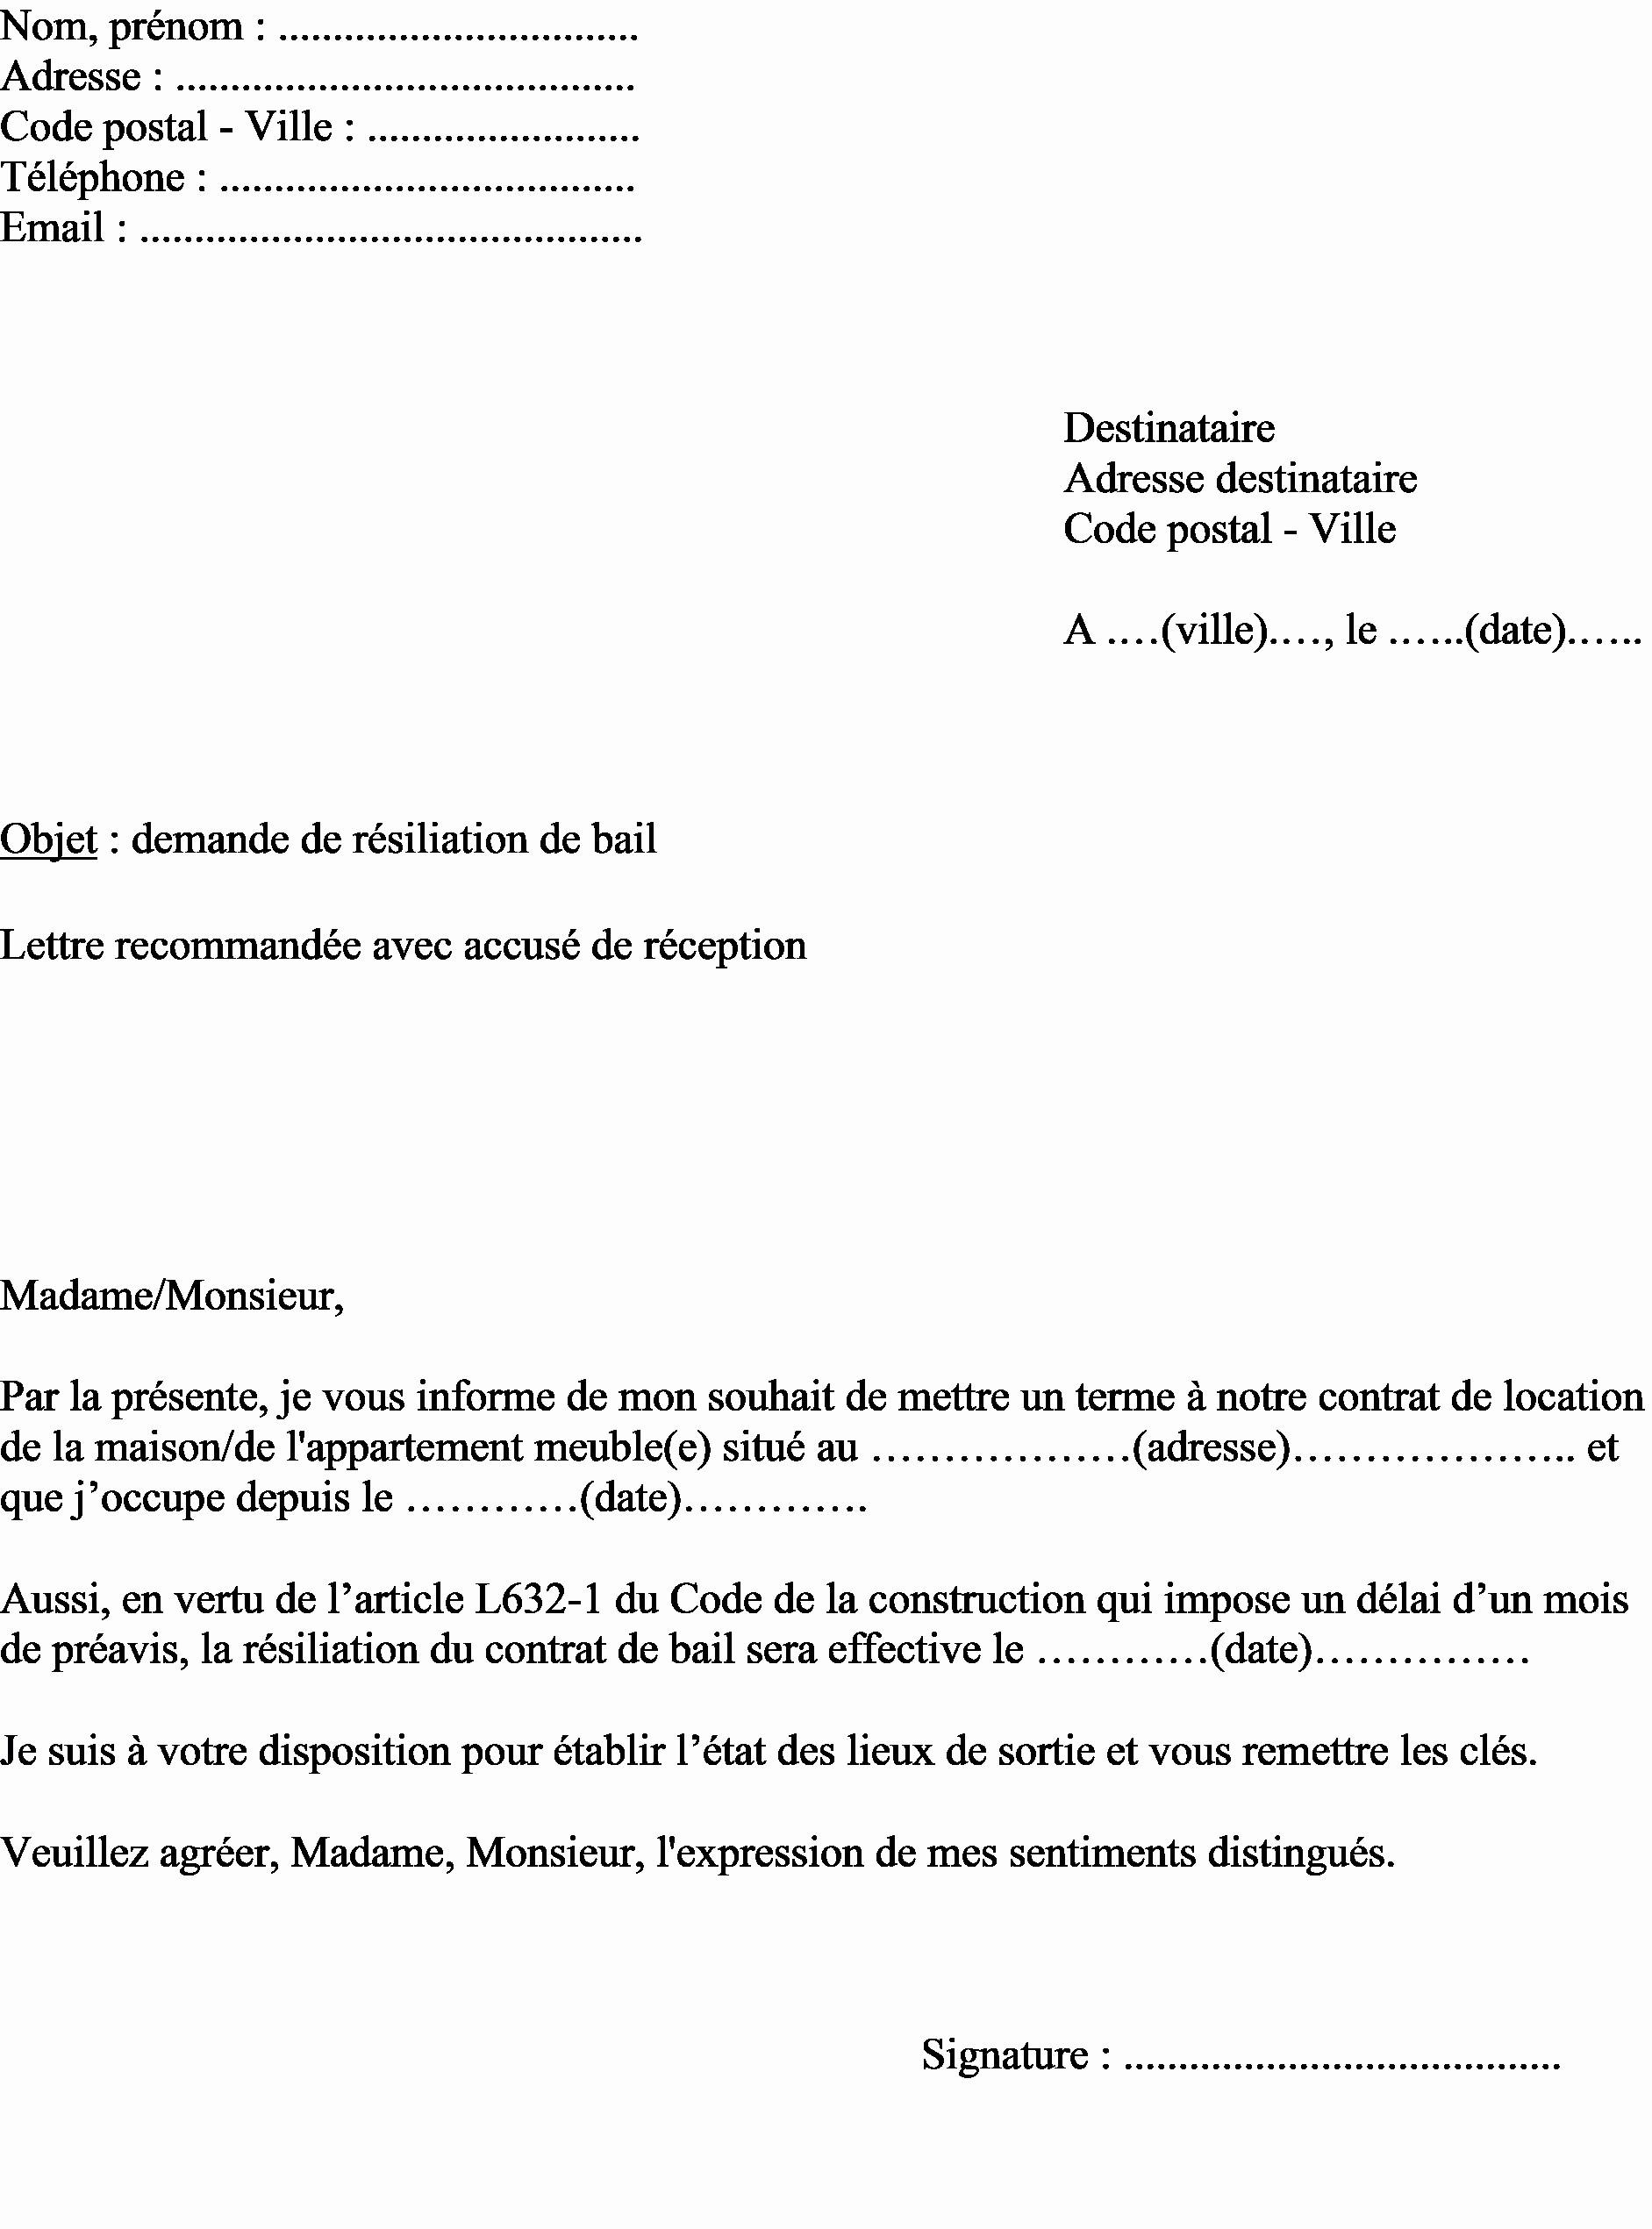 Modele Contrat Location Meuble Bail De Location Meublee Pour Bail De Location Meuble Agencecormierdelauniere Com Agencecormierdelauniere Com